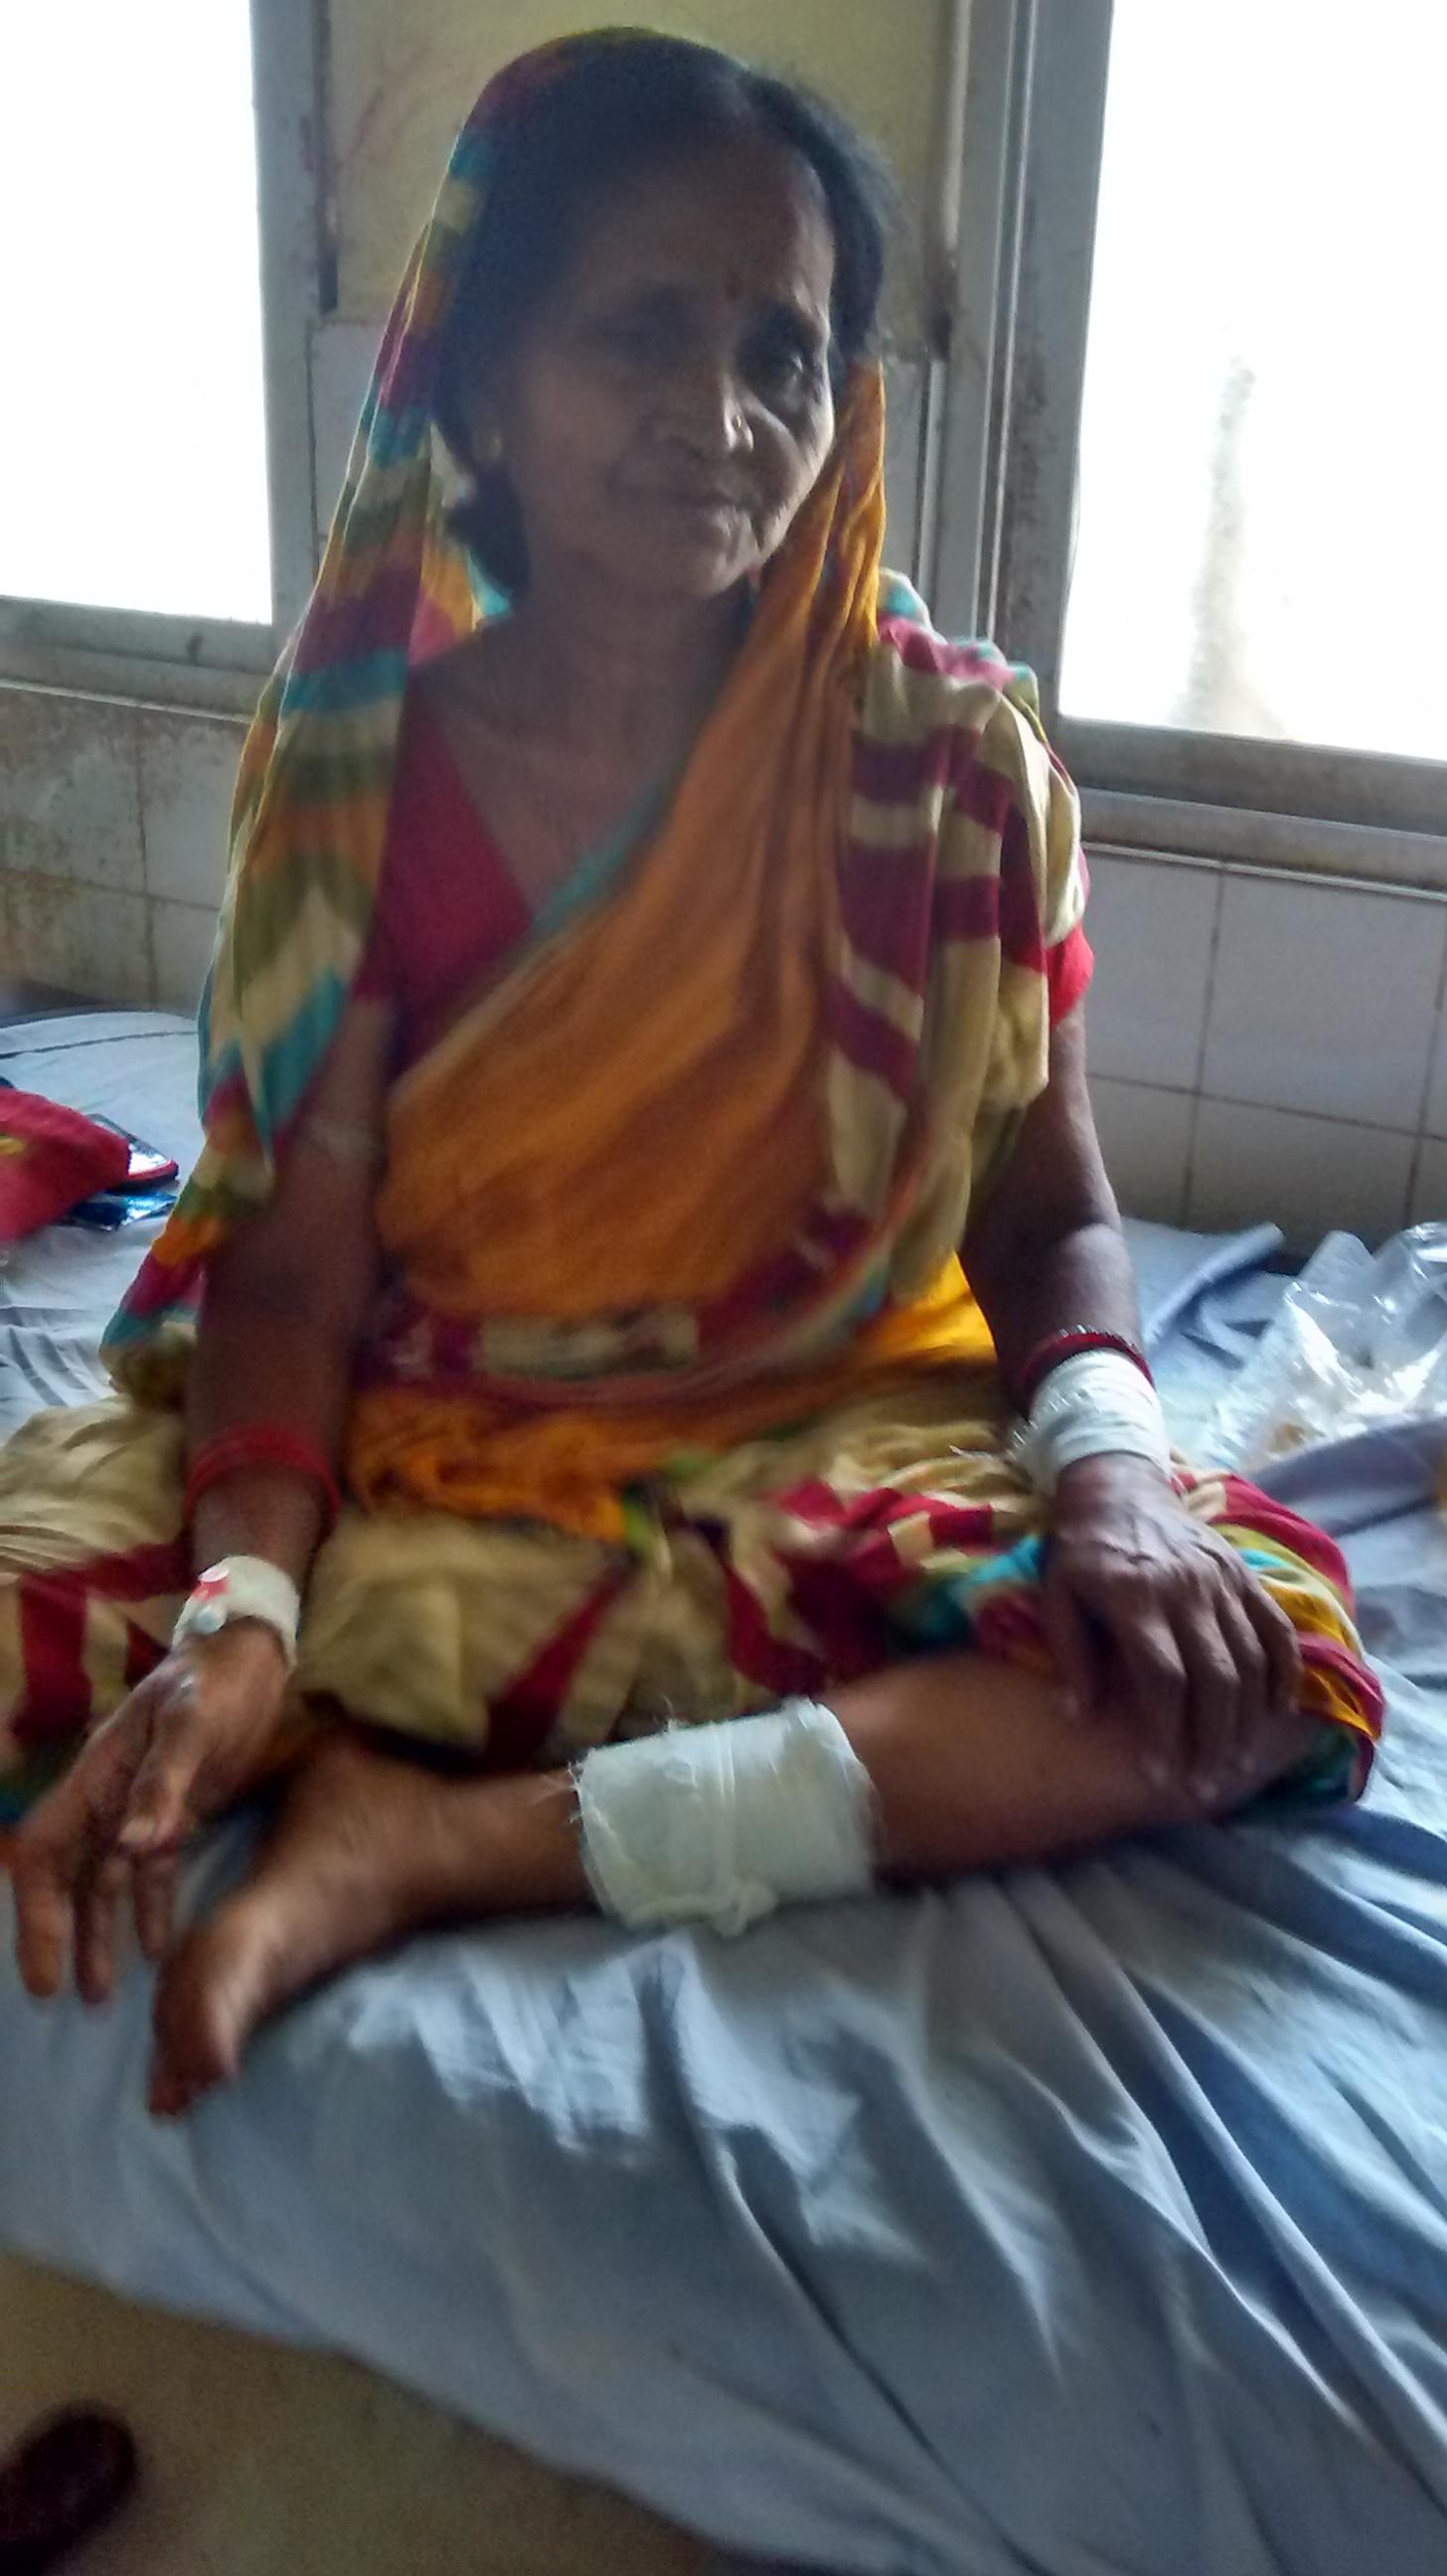 Basanti Palai, injured in the attack. Credit: Ranjana Padhi